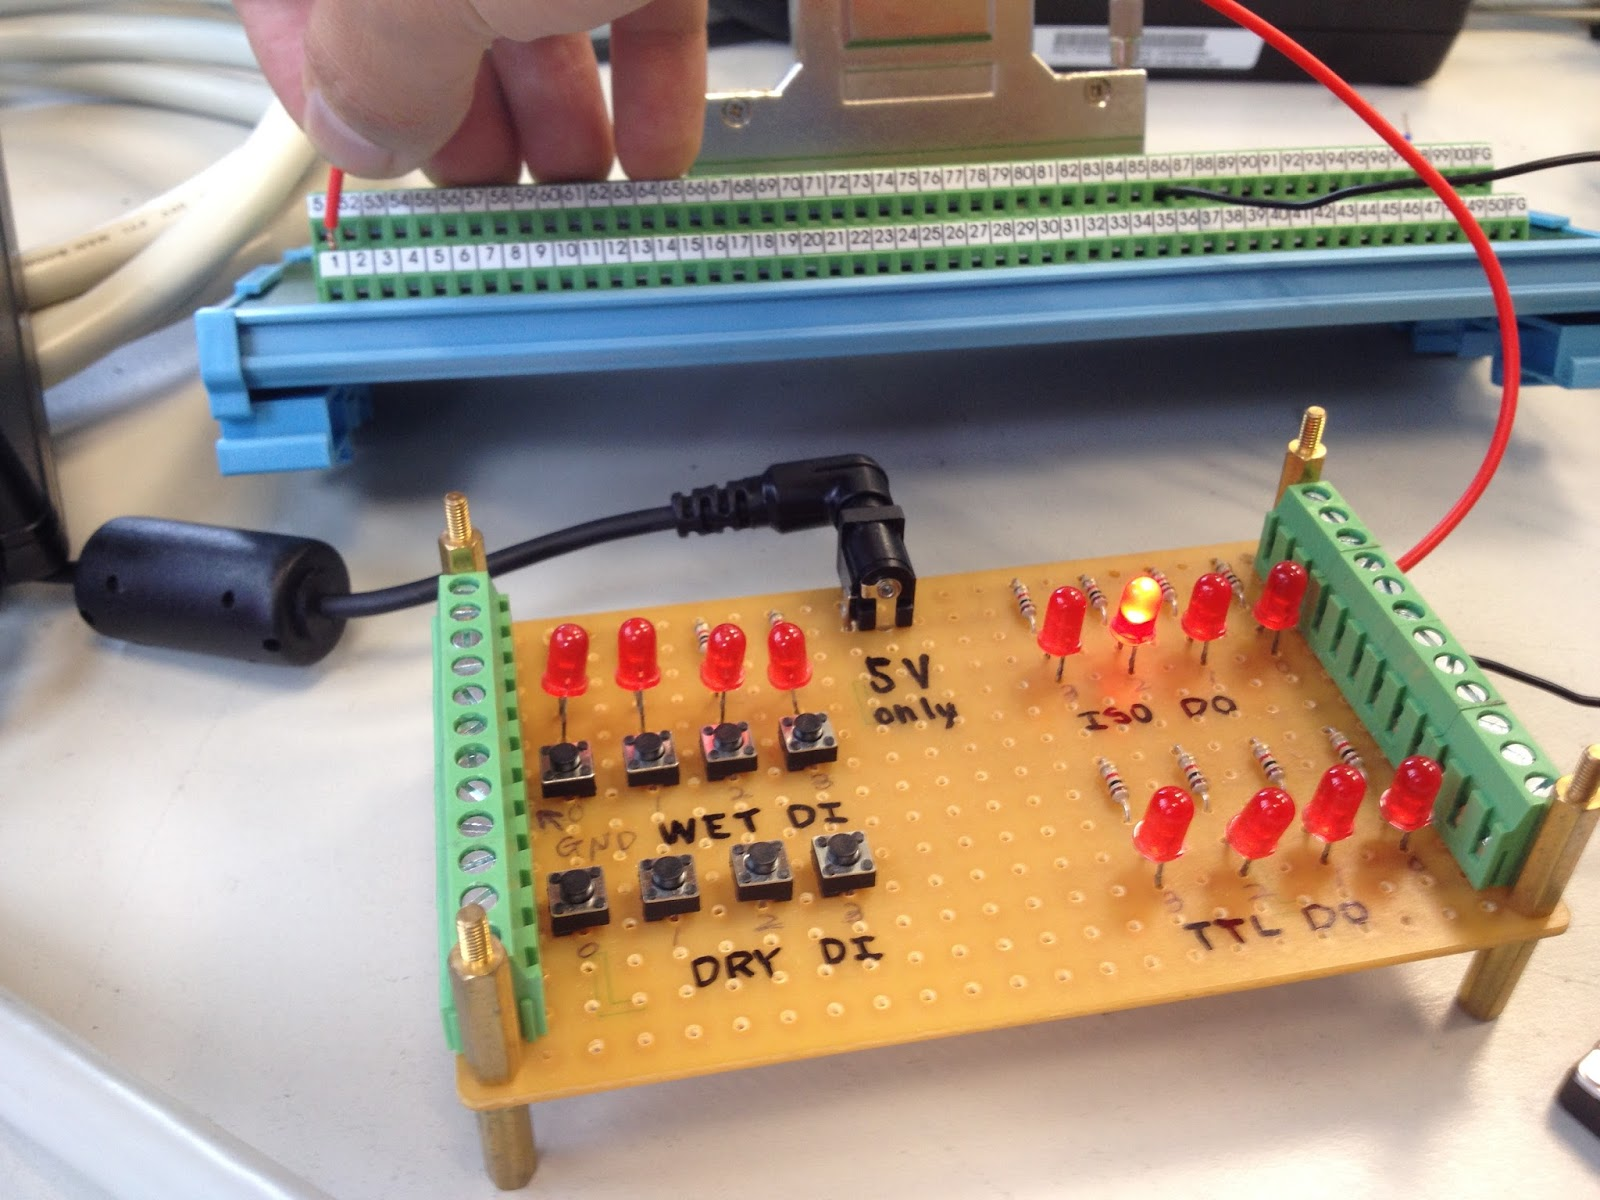 PCI-1752U IDO Function Test with DAQNavi